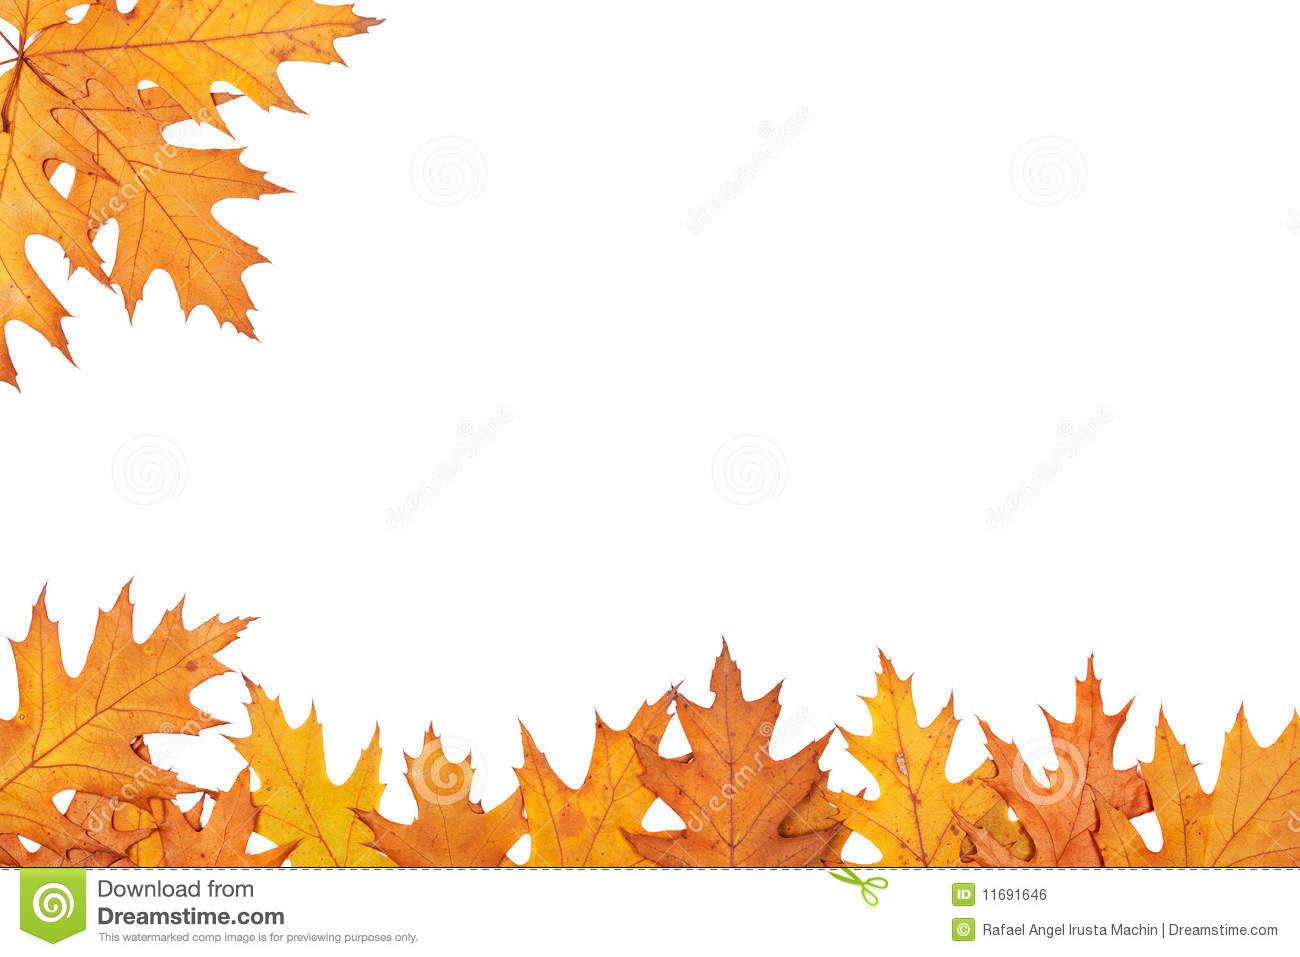 Free Fall Autumn Clip Art Borders